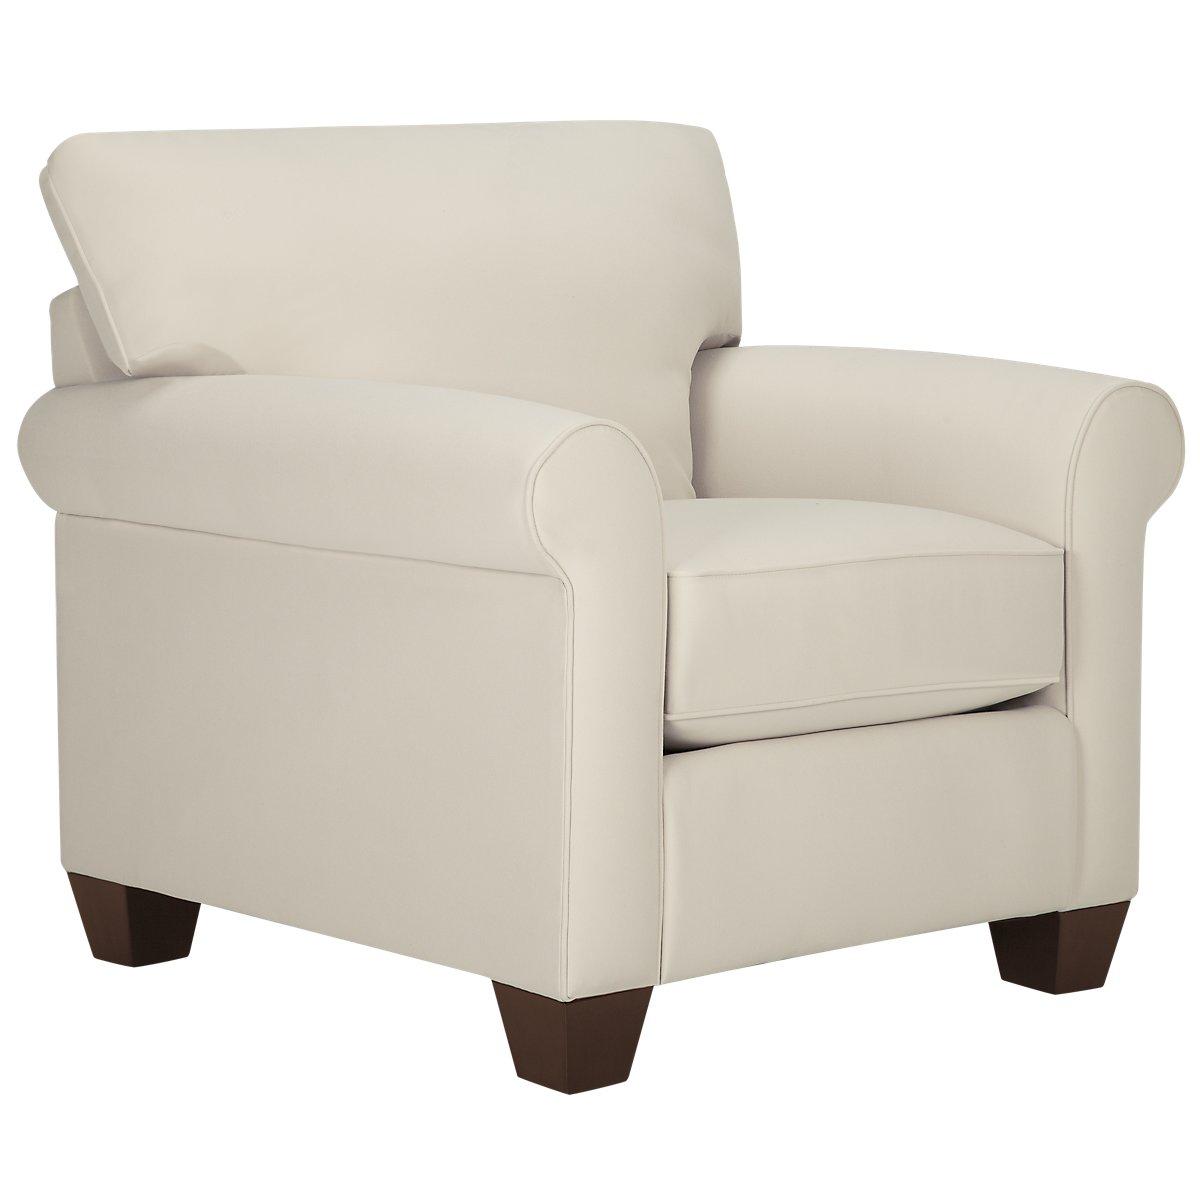 Corlis Light Beige Fabric Chair